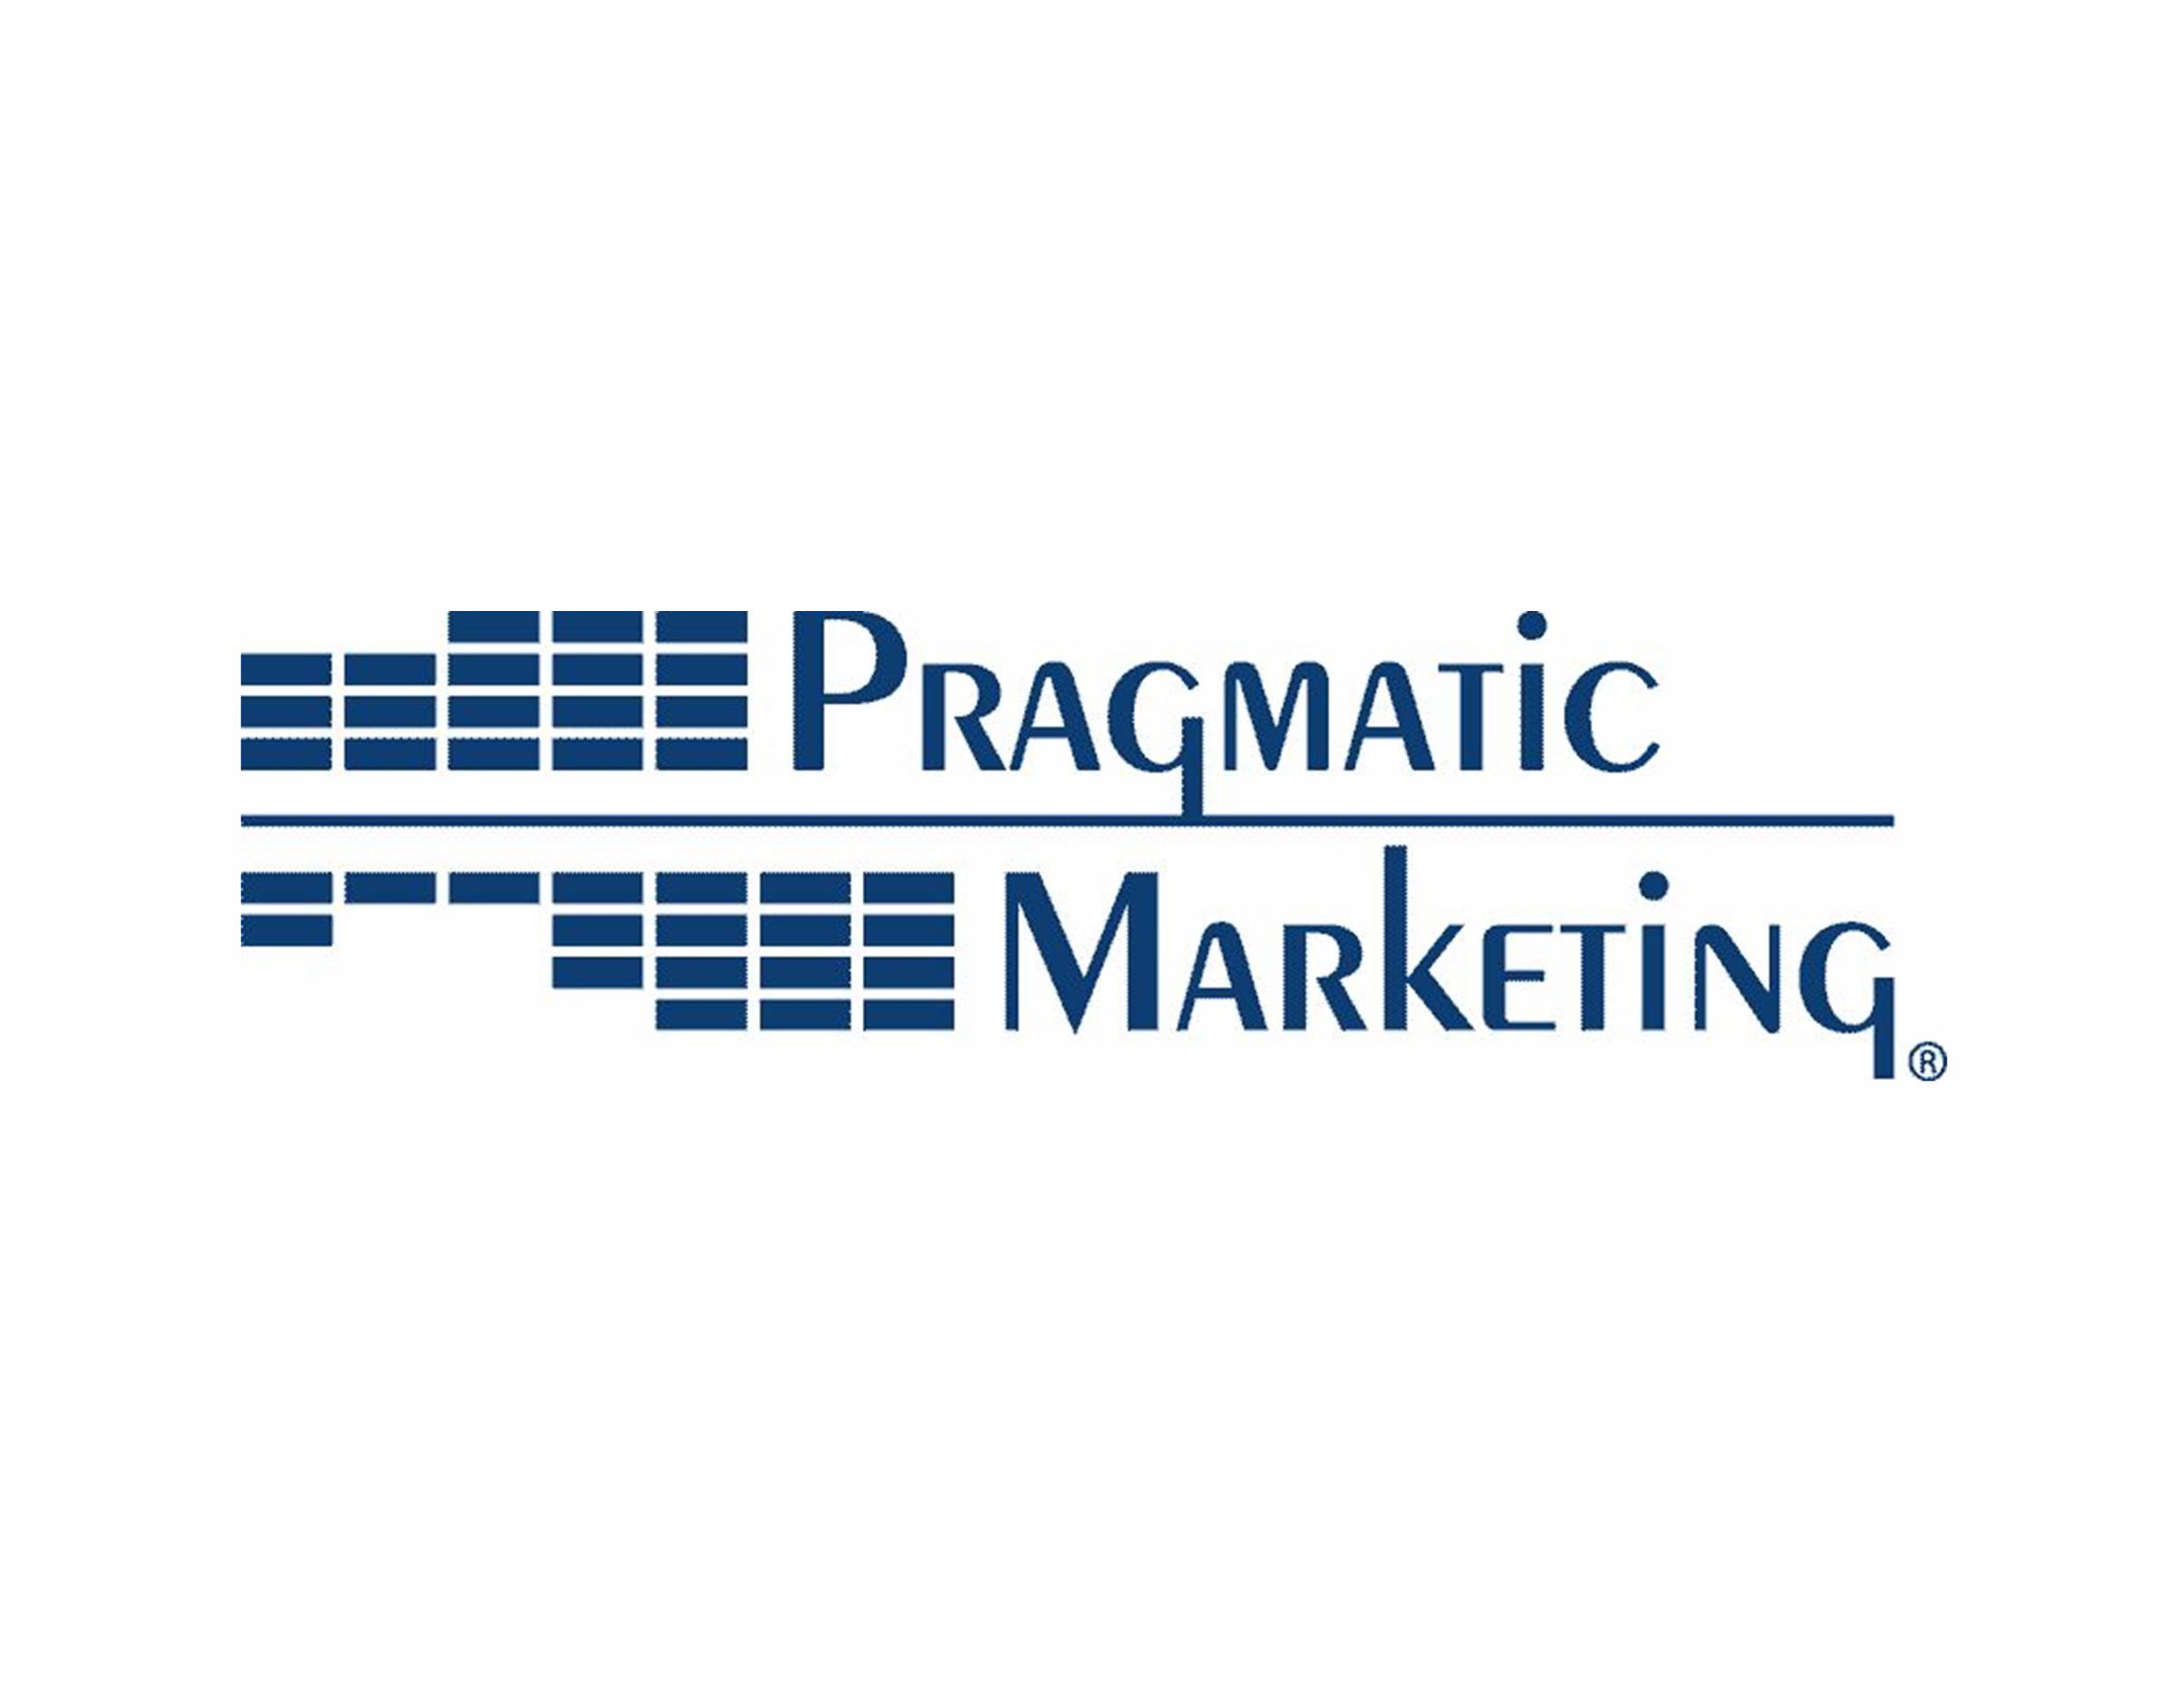 Pragmatic Marketing Surpasses 60,000 Seminar Attendees